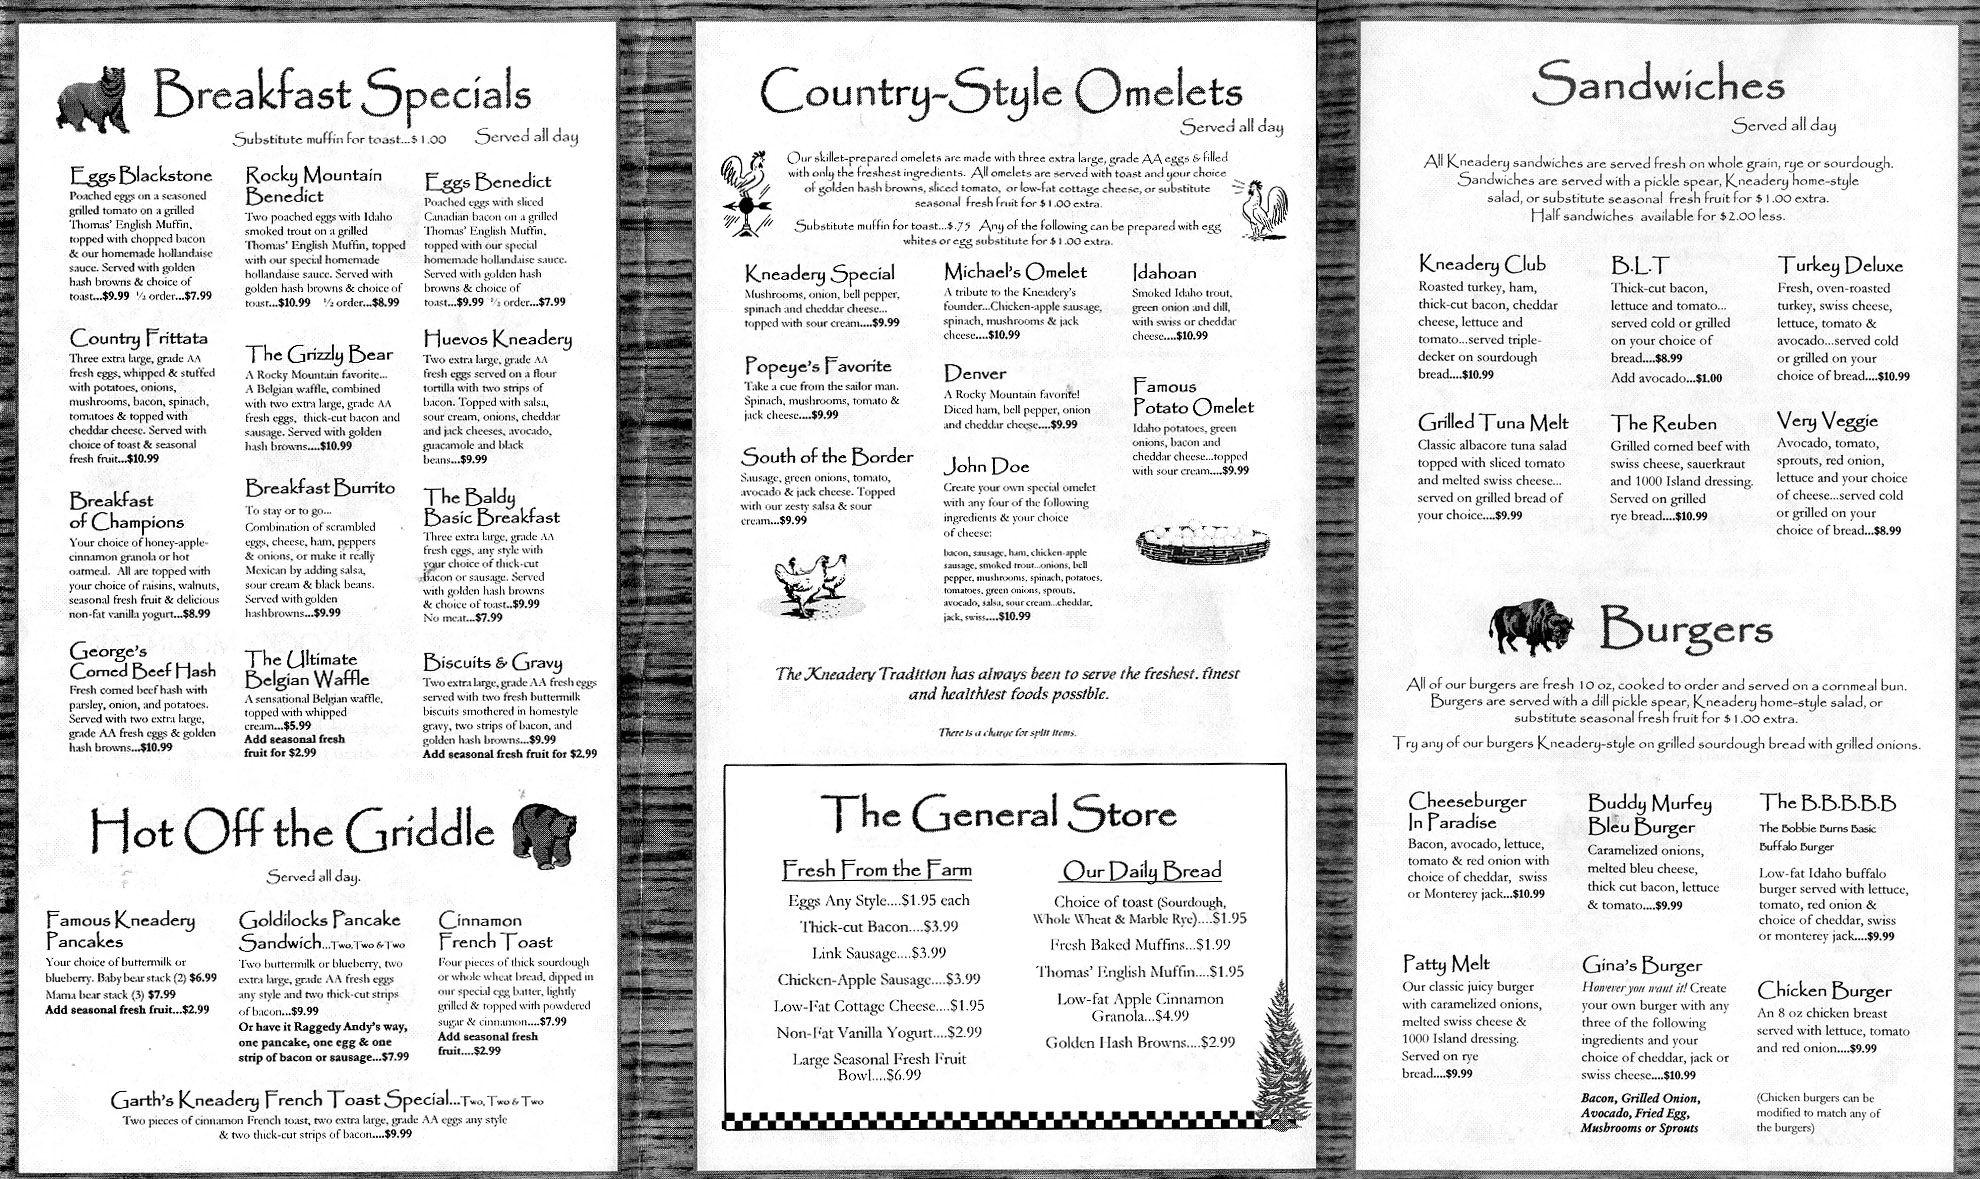 kneaders menu google search food eating out 2 the menus